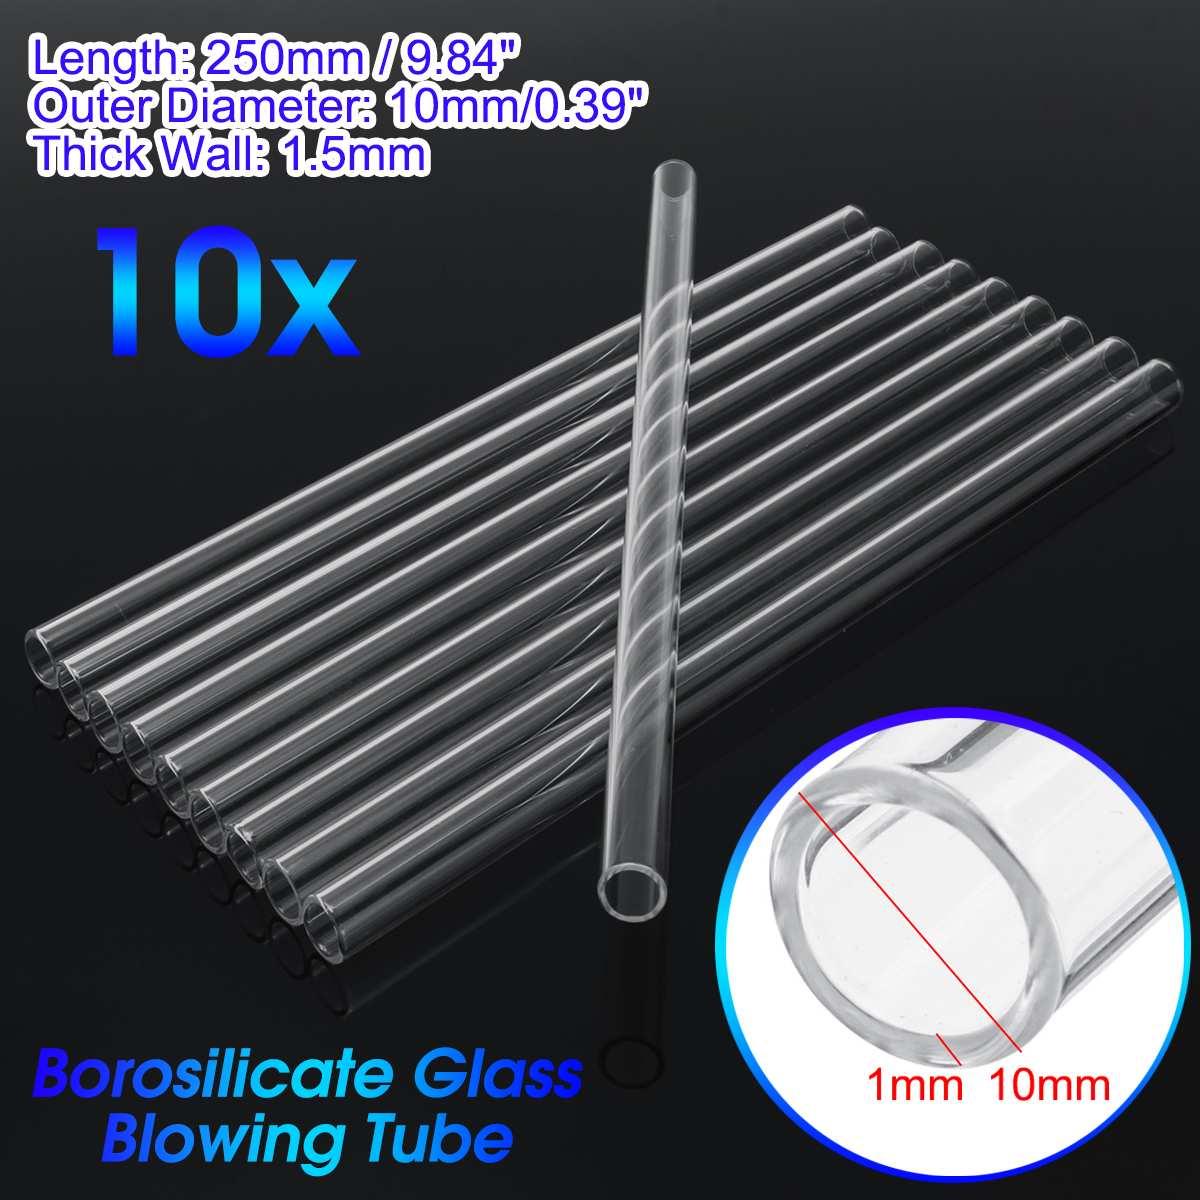 Wholesale 10x Laboratory 250x10x1.5mm Test Tube Transparent School Tool Glass Buret Mixer Glass Stirring Rod Lab Stiring Stirrer